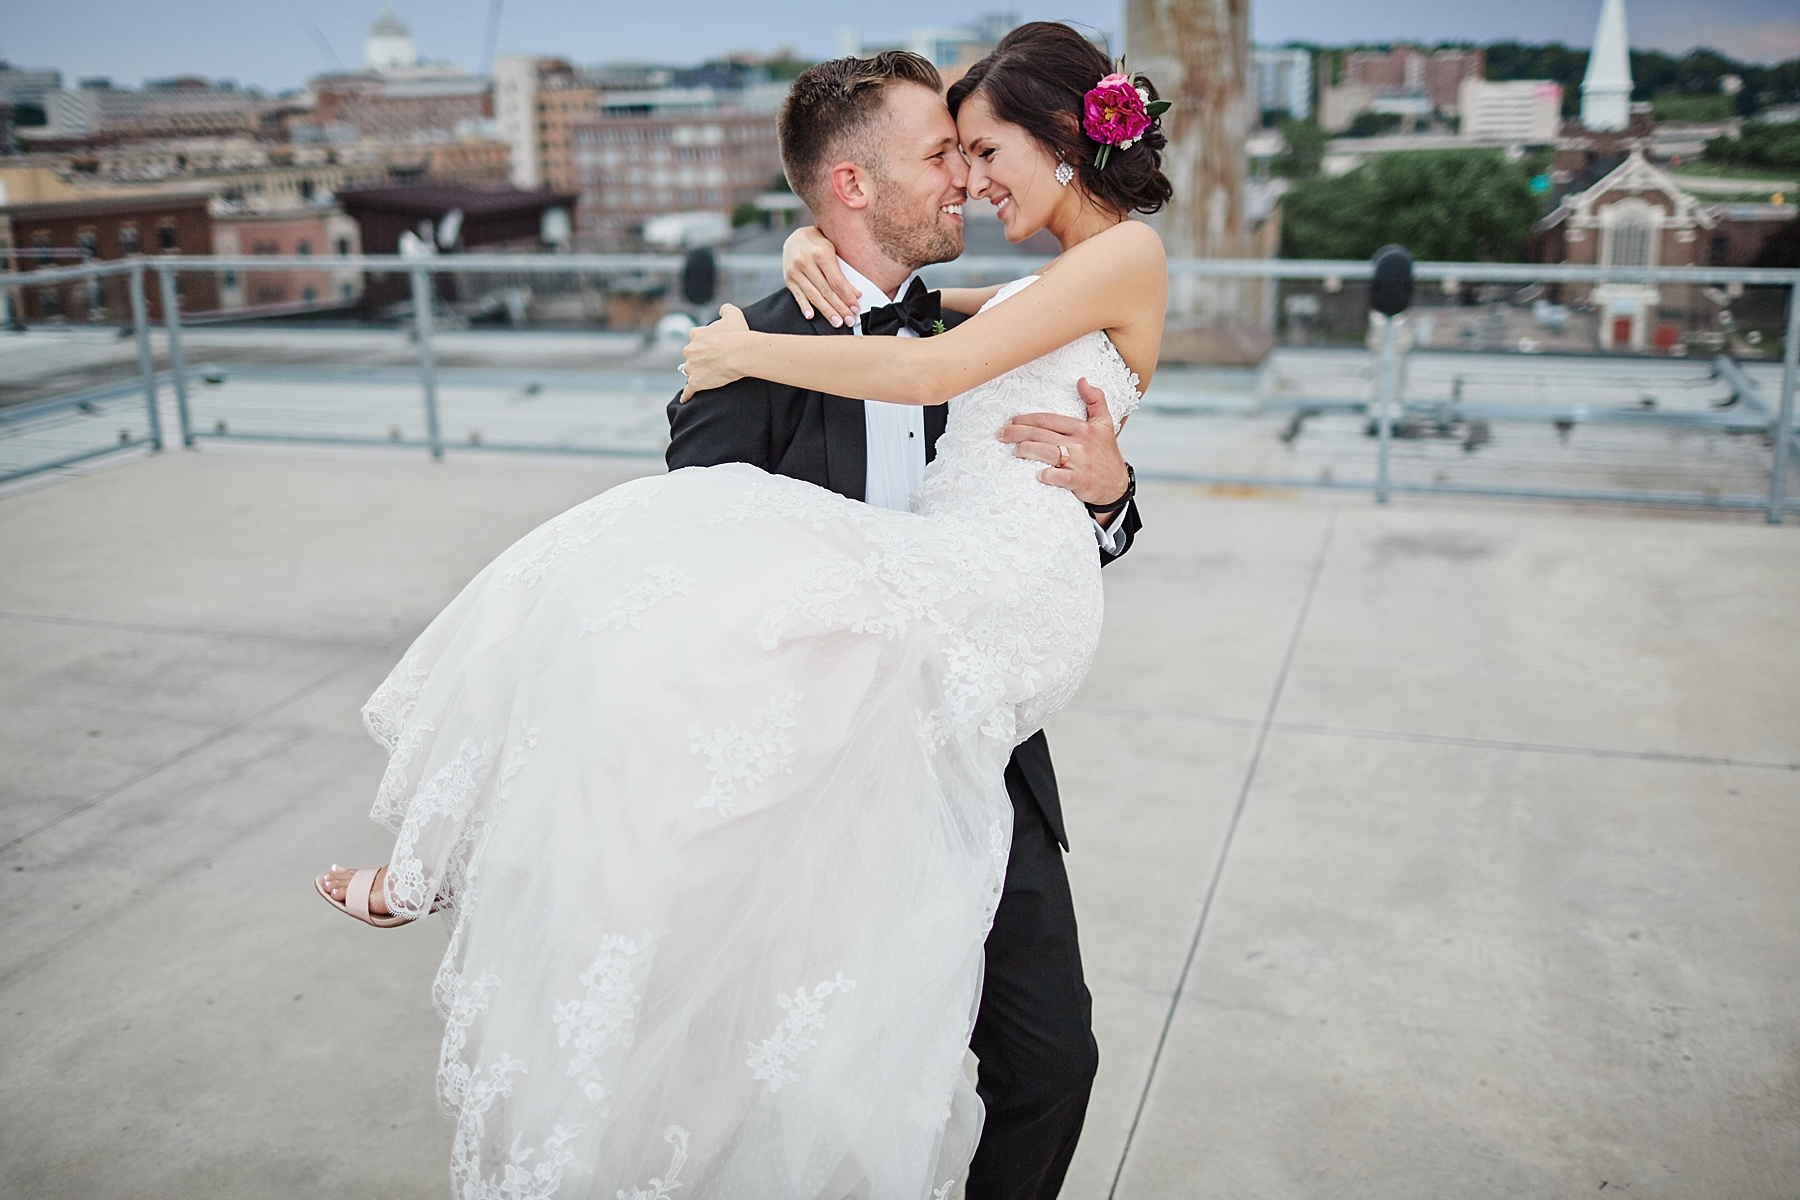 ABULAE-Wedding-Saint-paul-MN-Josh-Sofia-Wedding-Mears-Park_0824.jpg